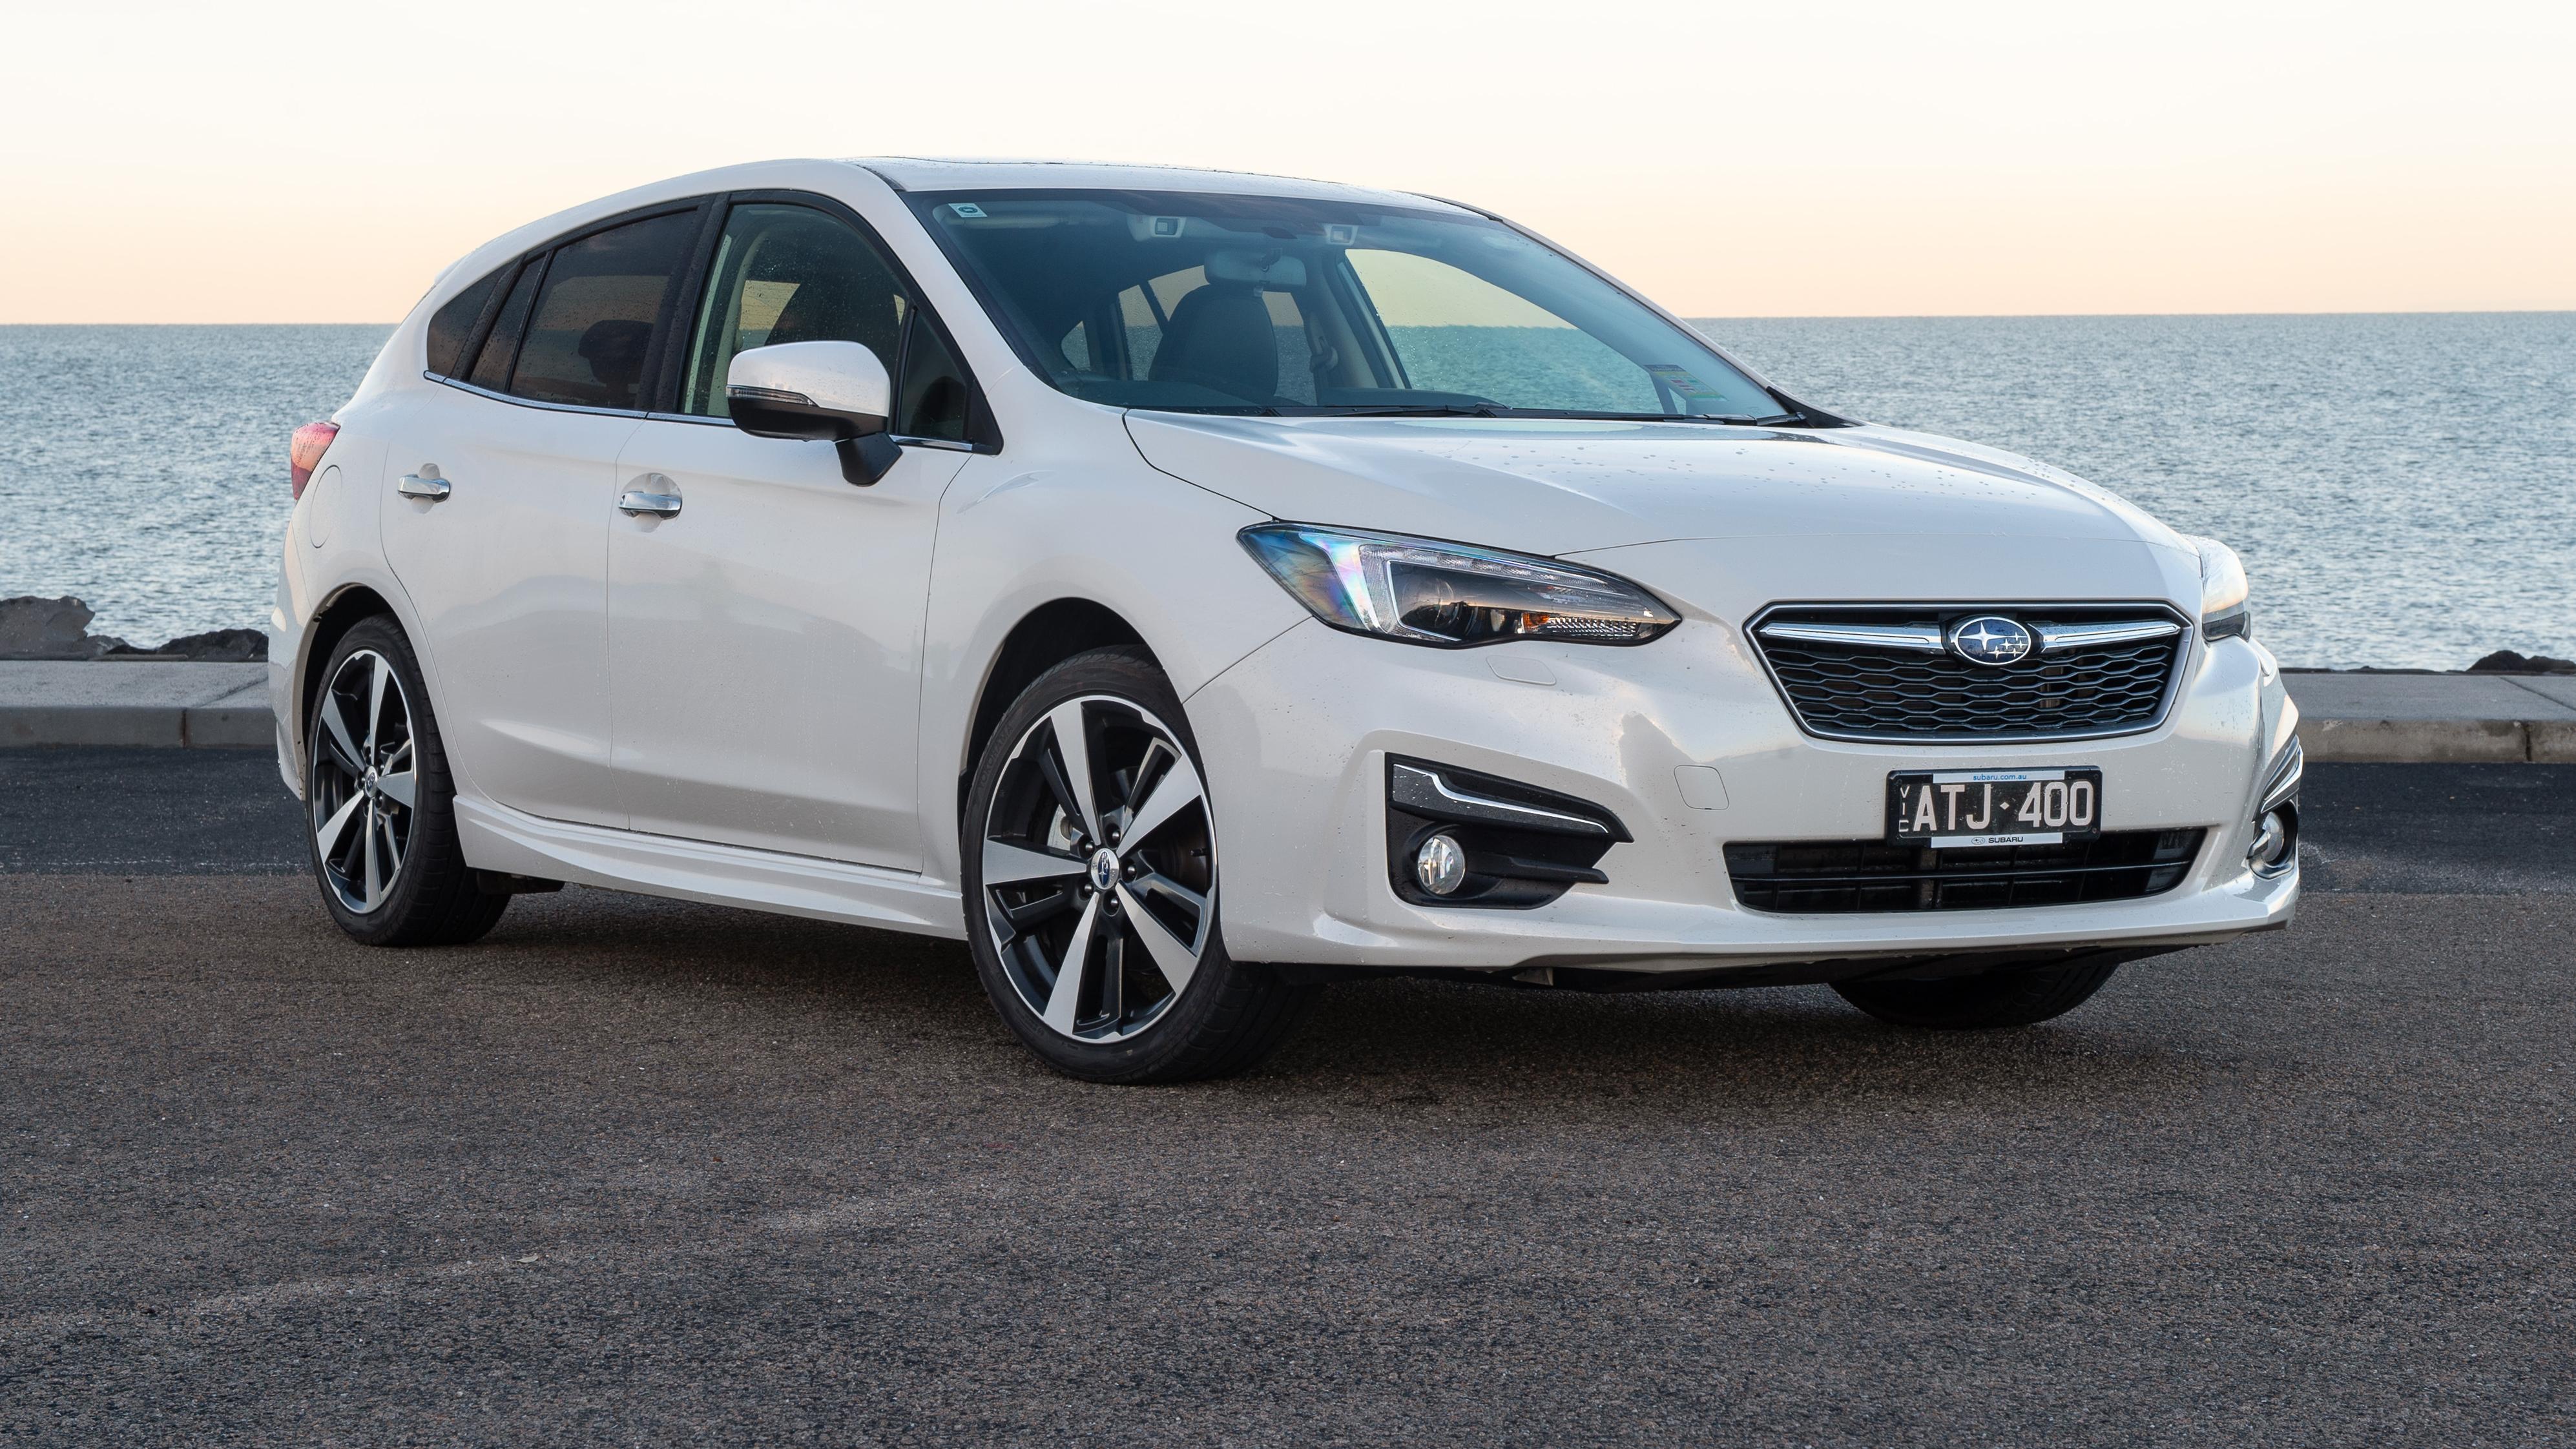 2018 Subaru Impreza 2 0i-S review   CarAdvice